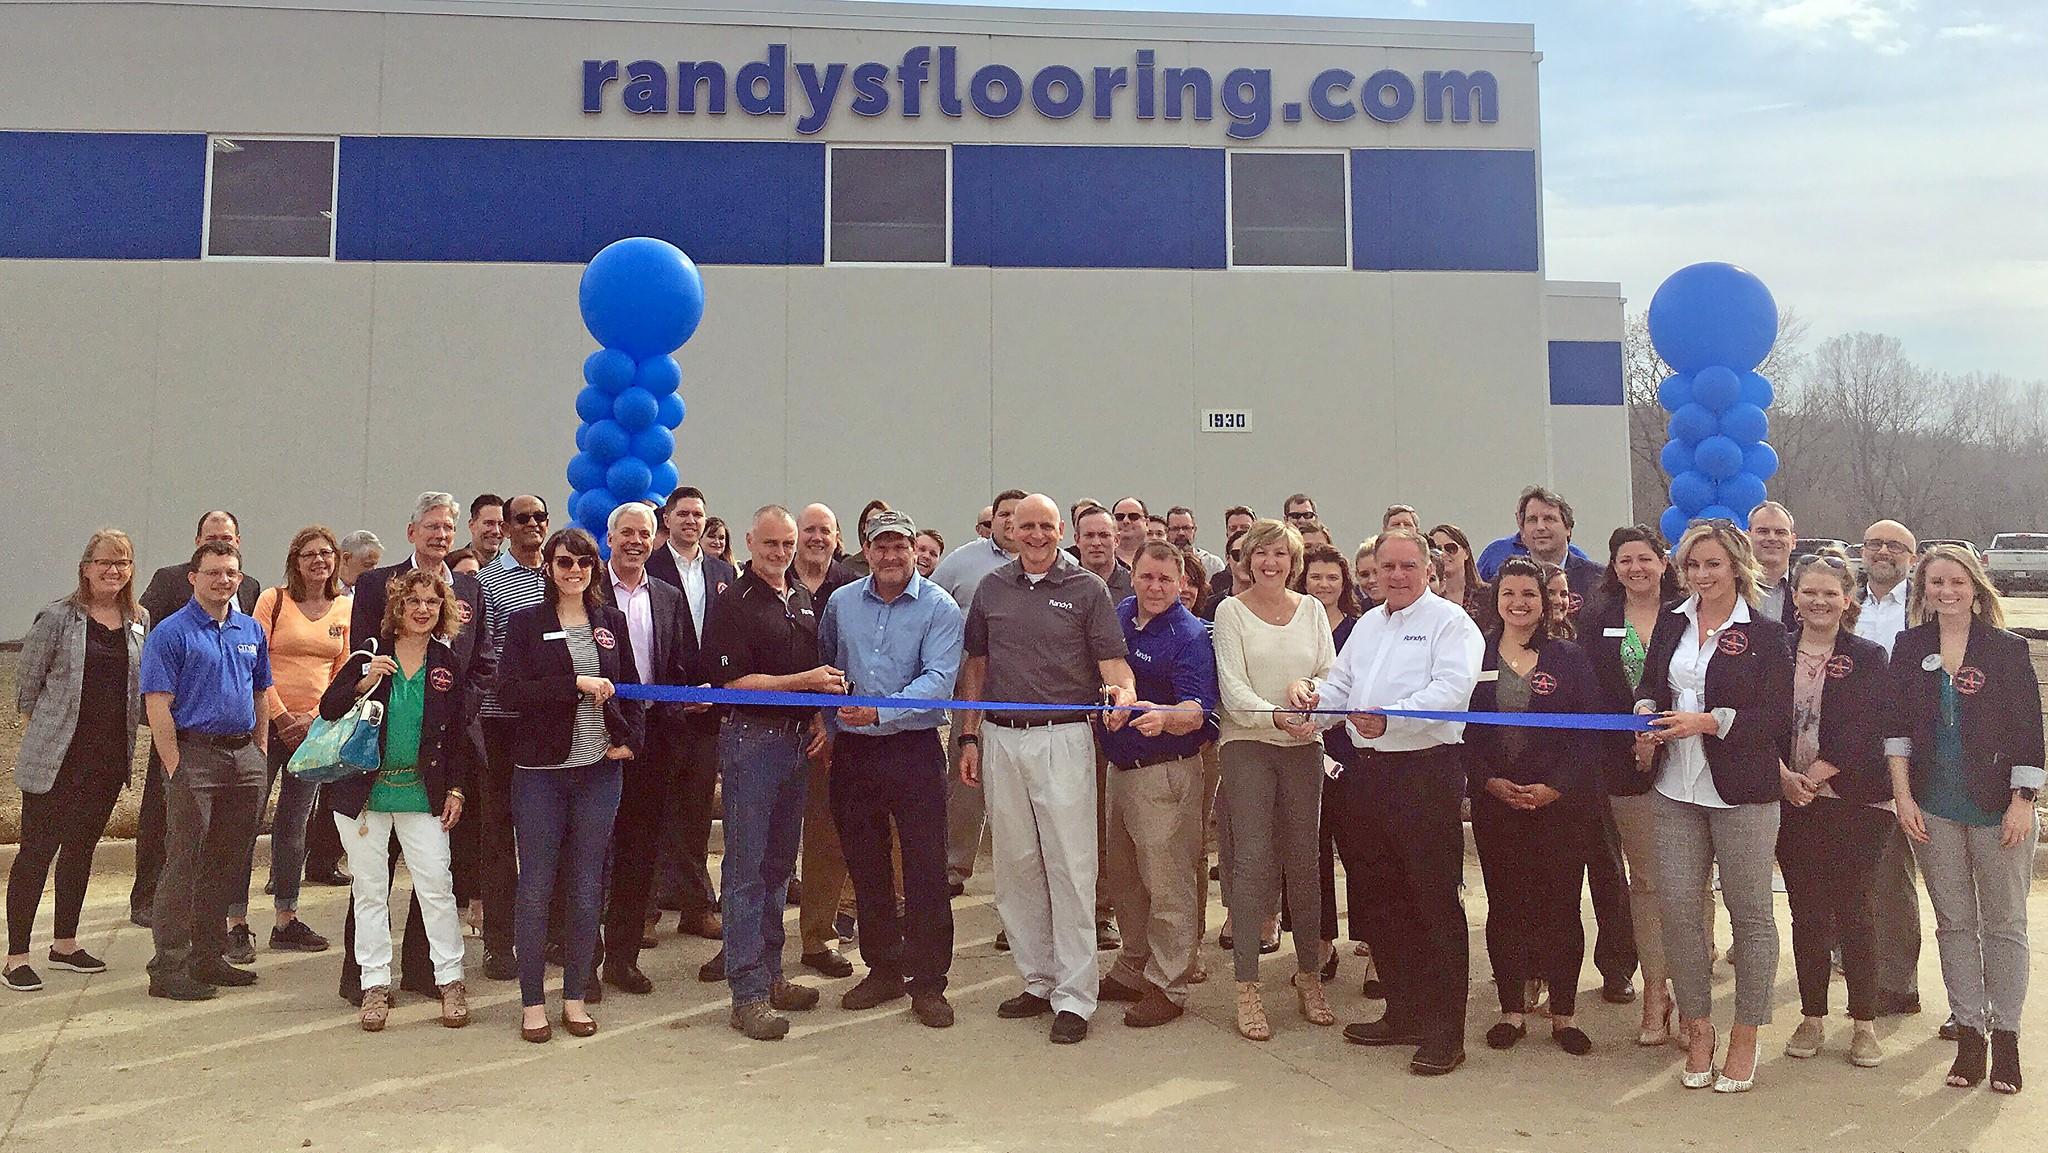 Randy_s Flooring RC